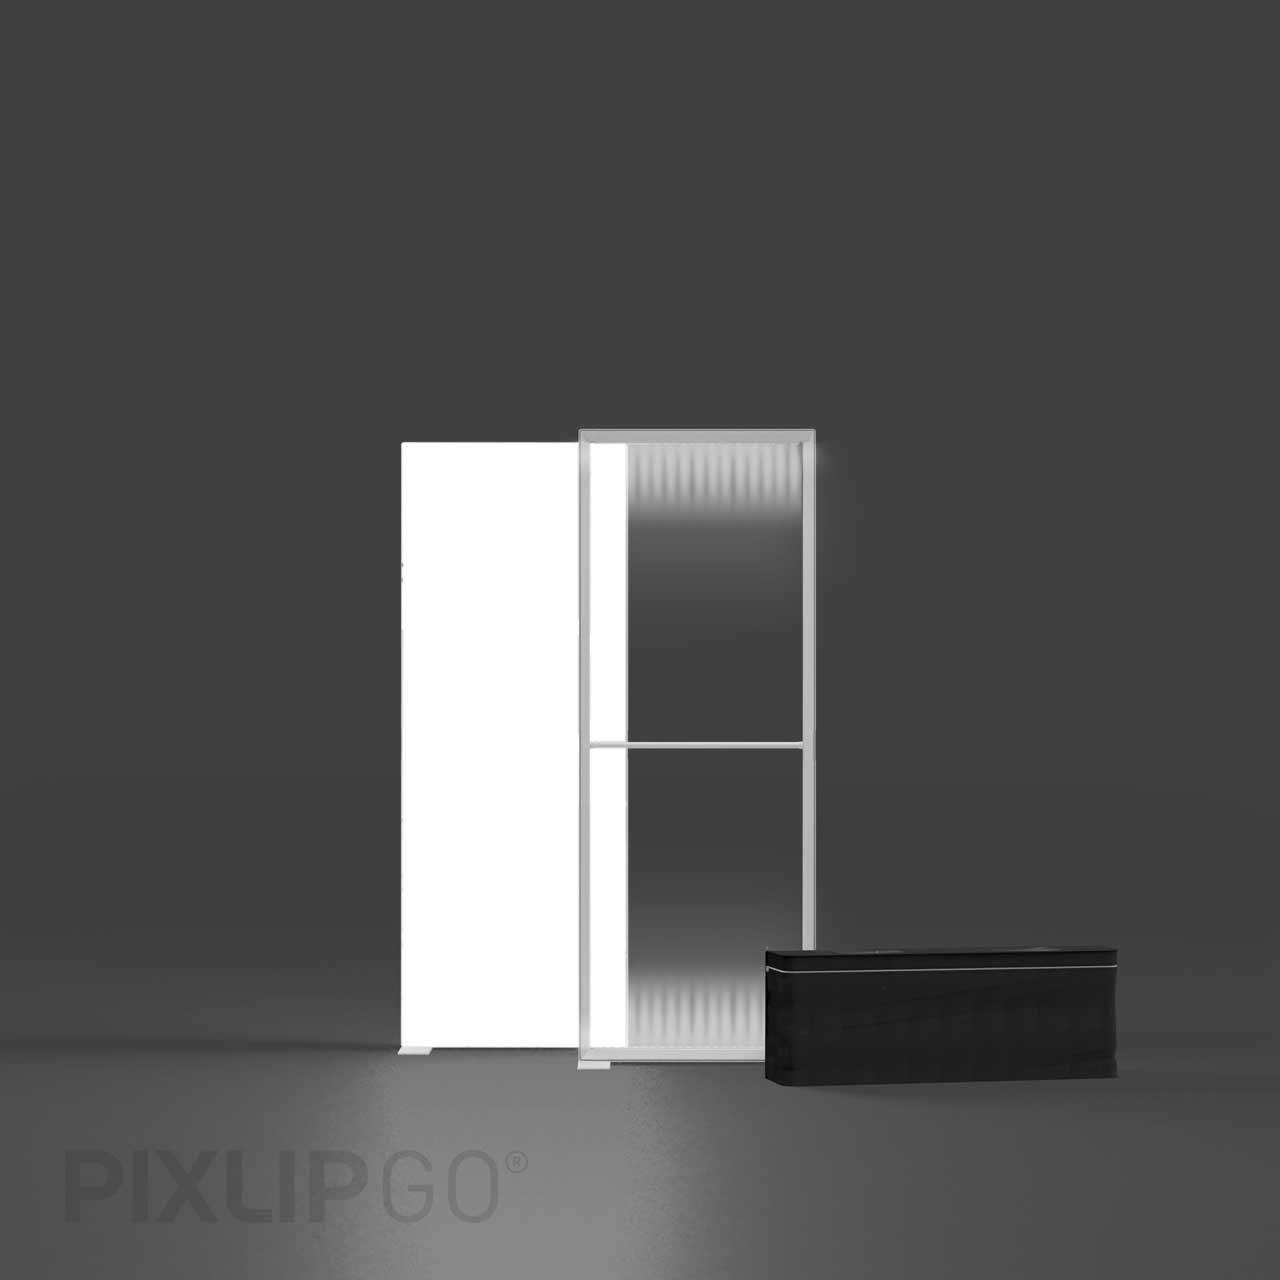 PIXLIP GO Lightbox Set 85 x 200 cm